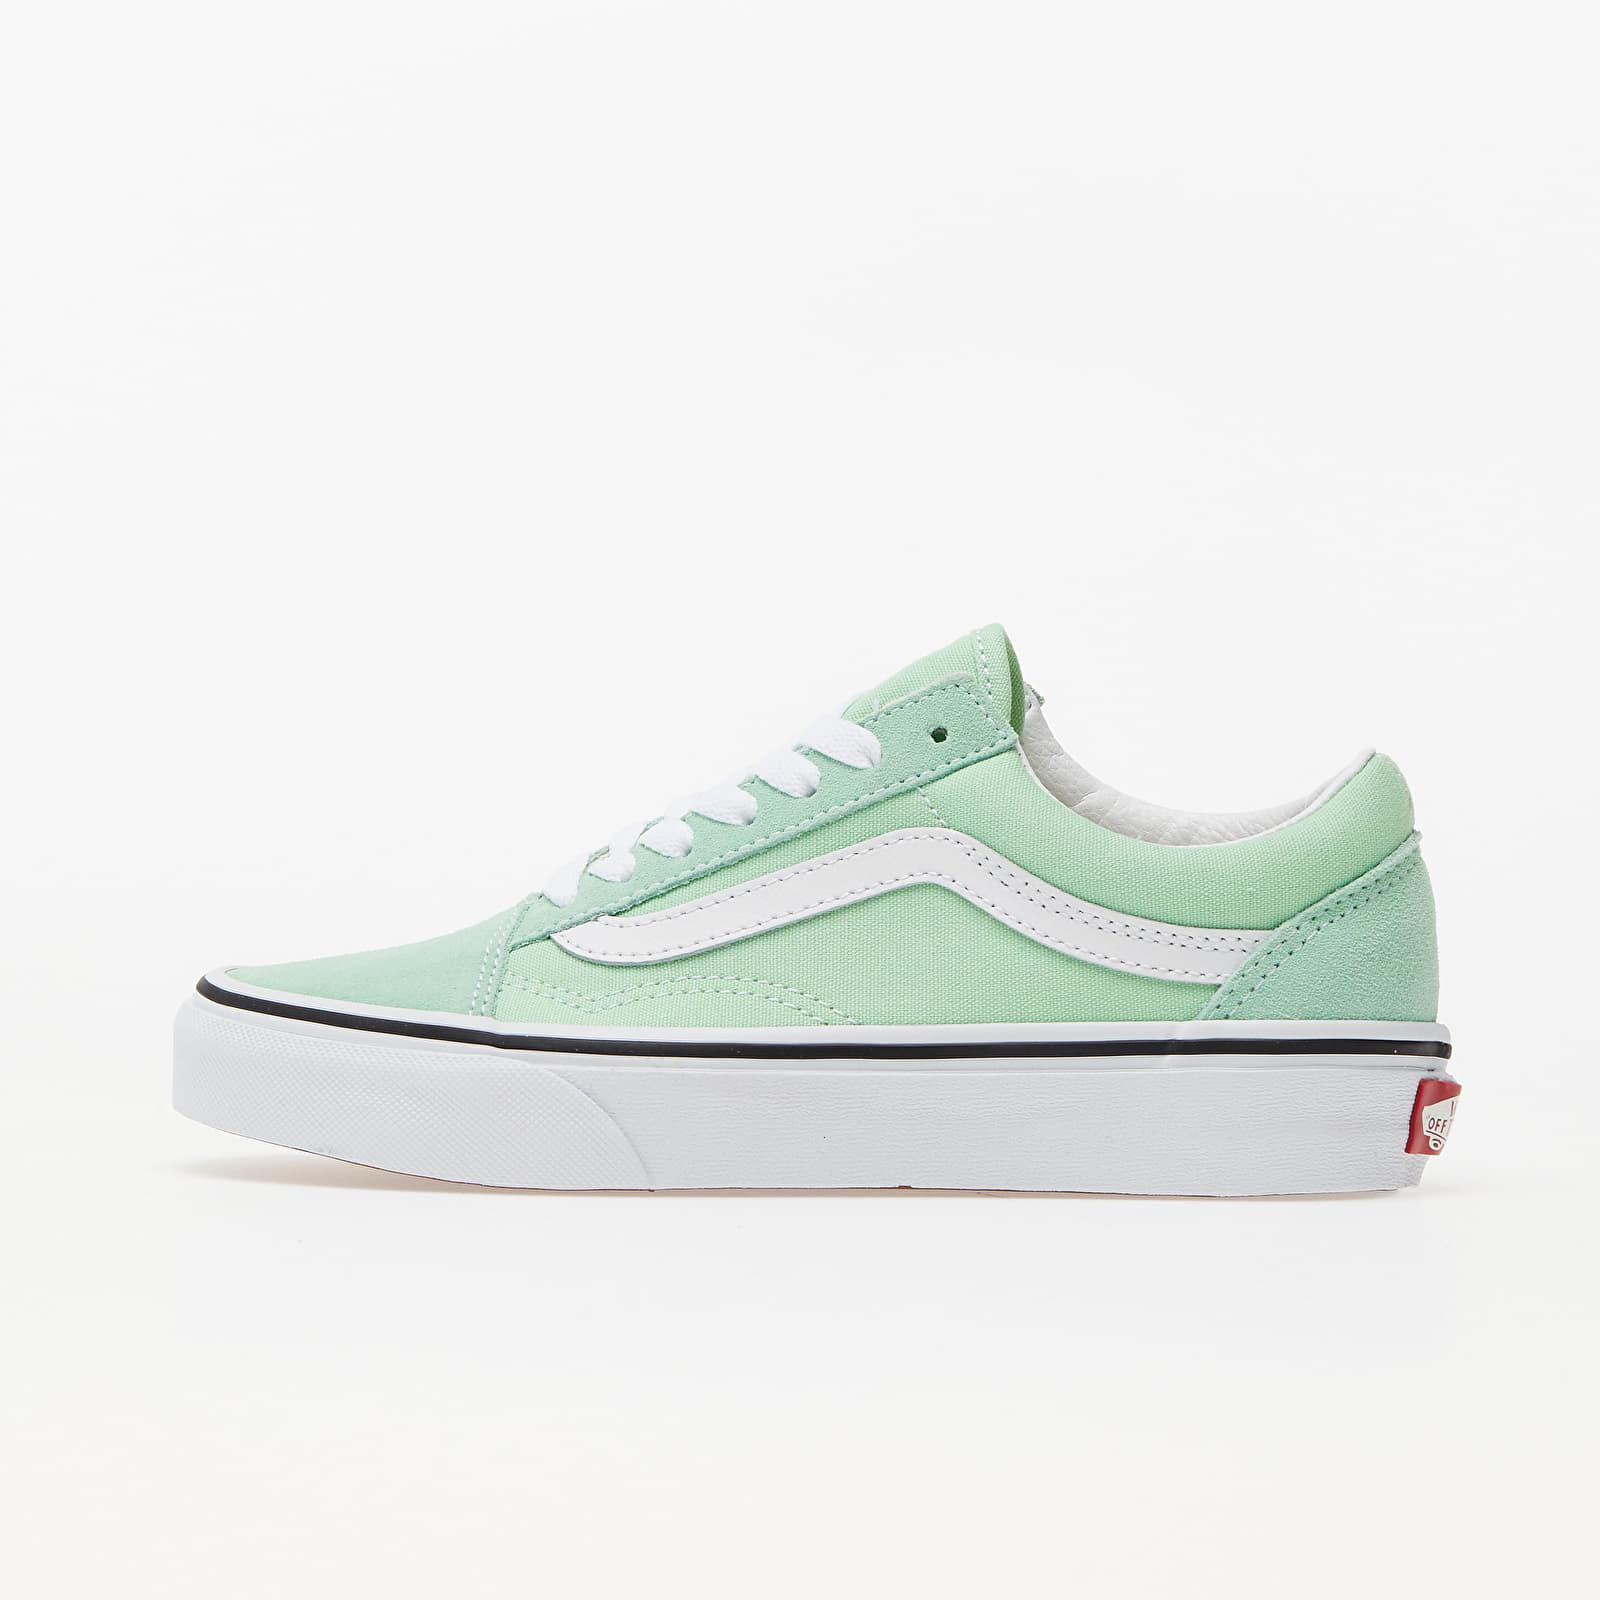 Pánské tenisky a boty Vans Old Skool Green Ash/True